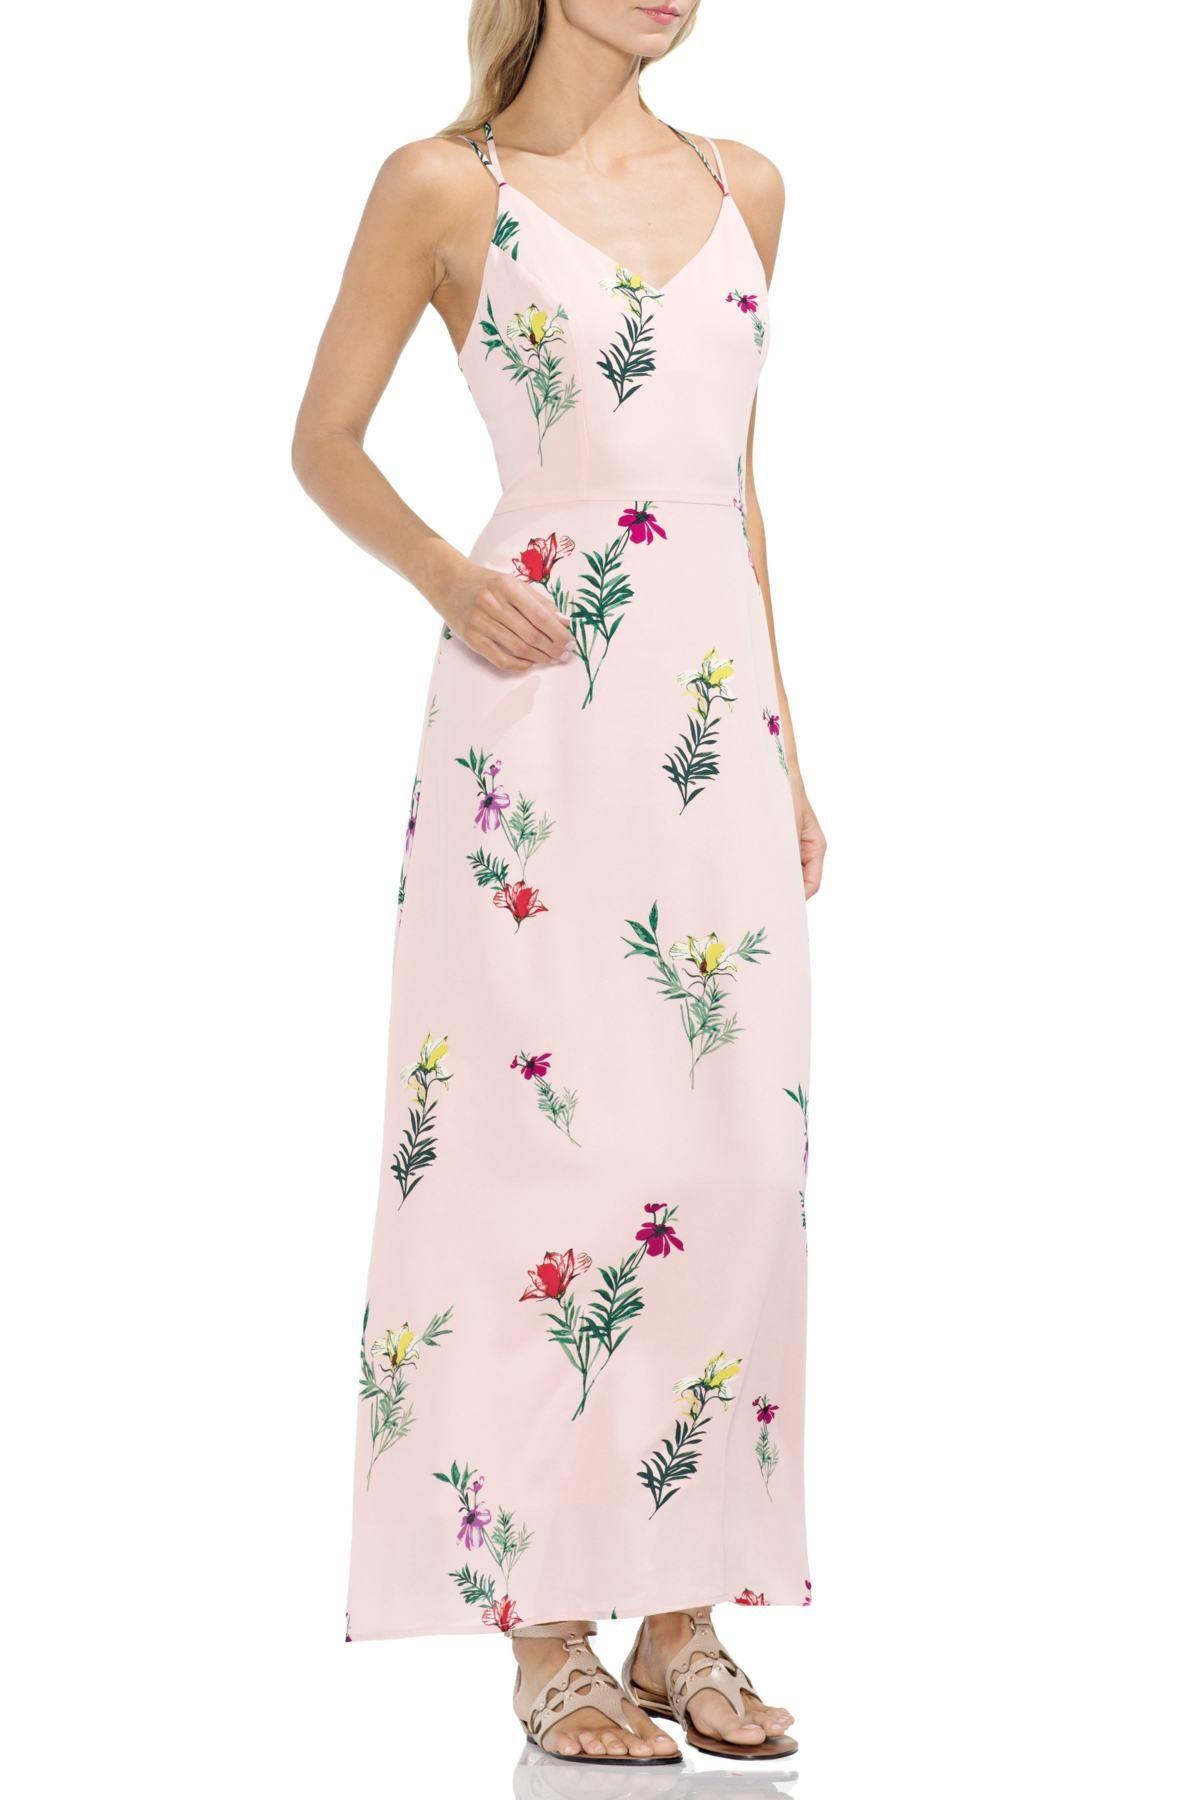 bd2050674452 Tropical Garden Maxi Dress | Products | Floral print maxi dress ...